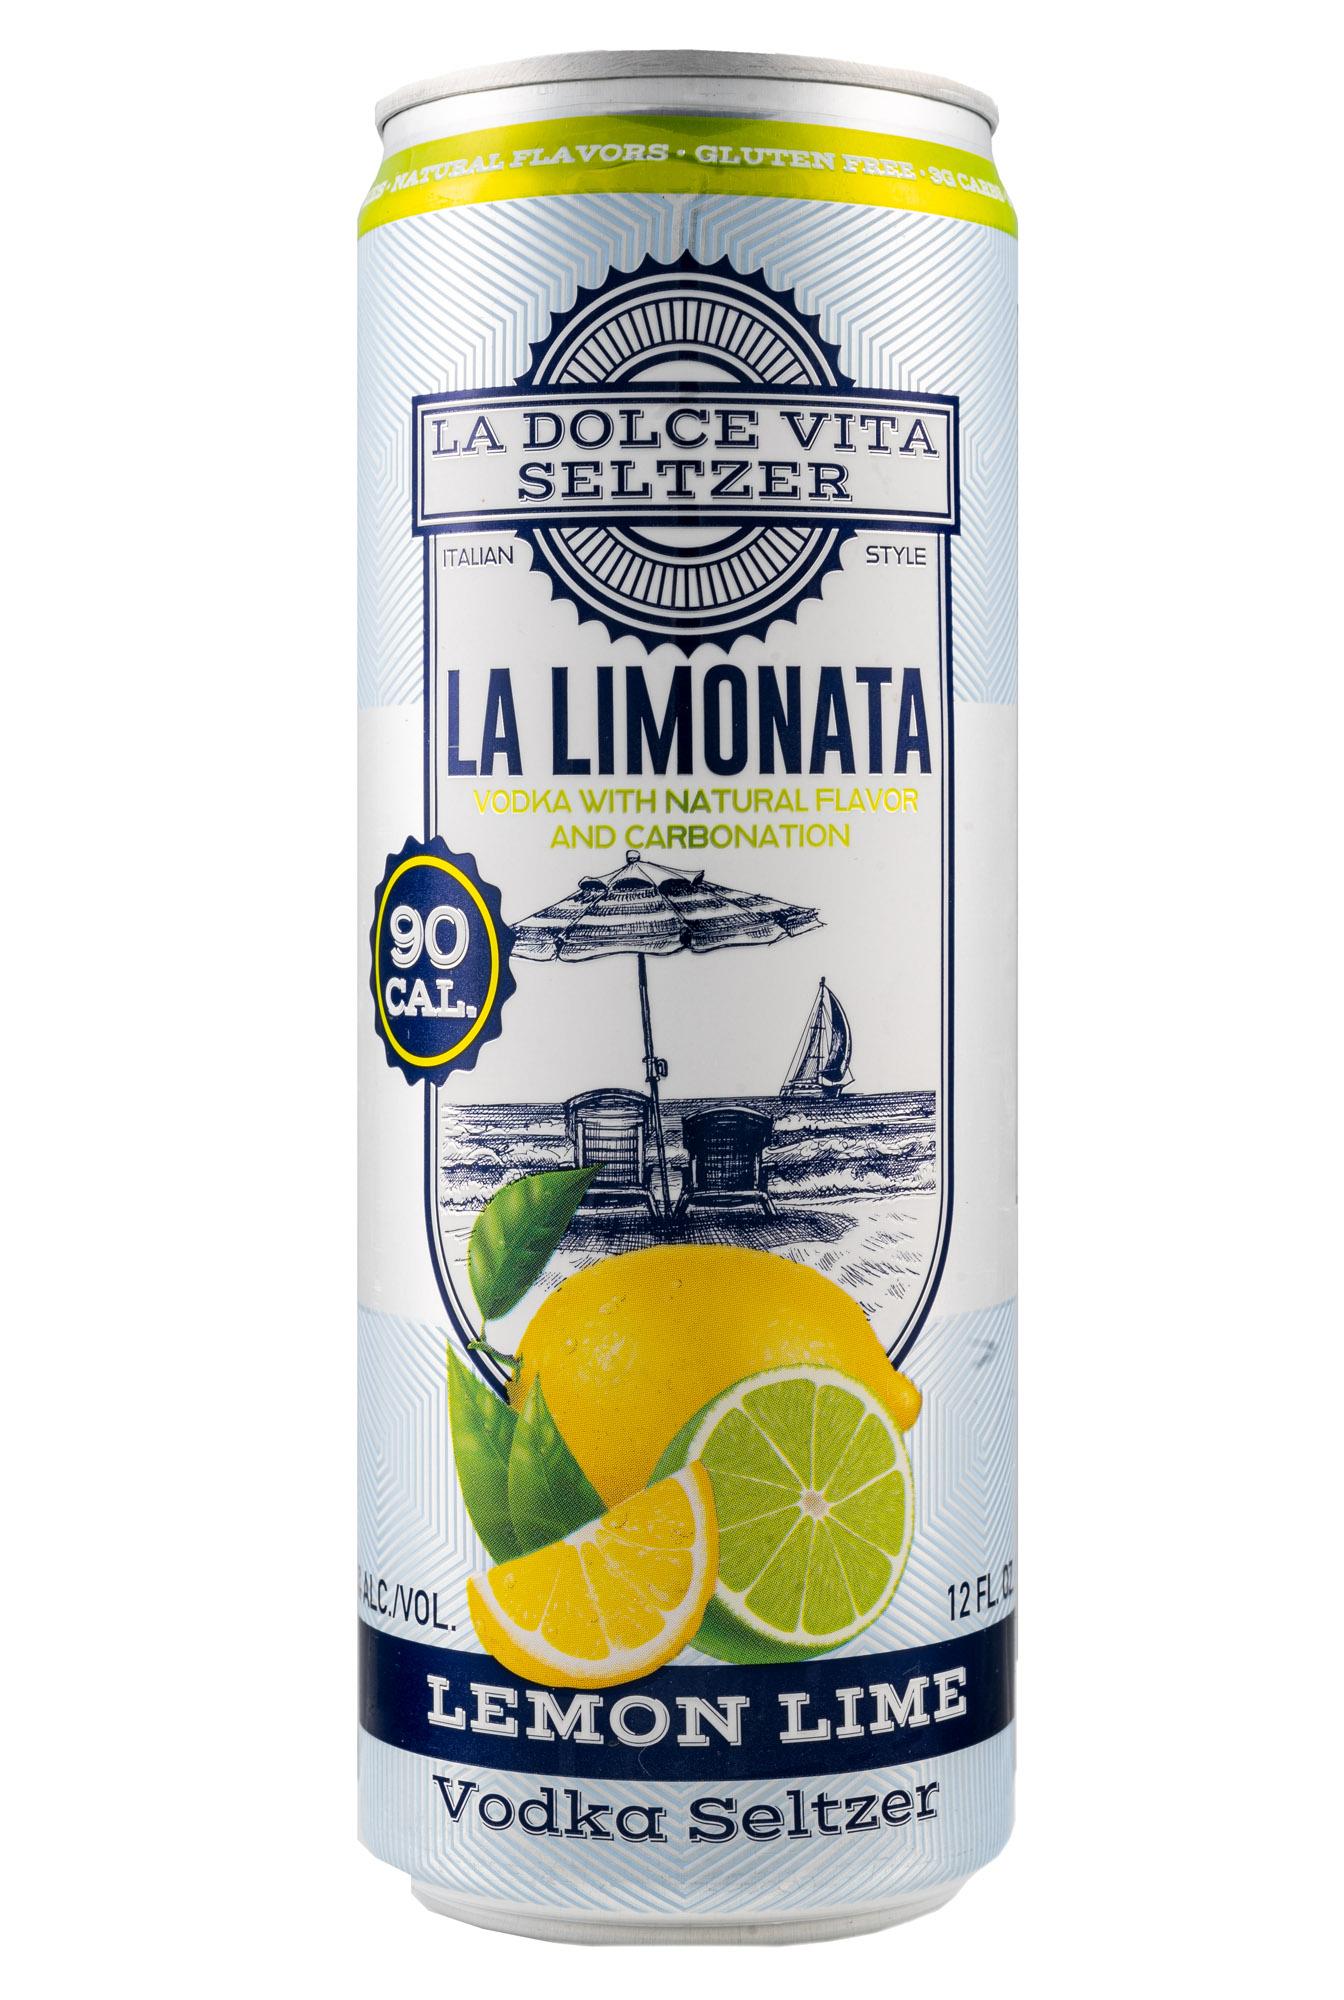 La_Dolce_Vita_03119-Limonata